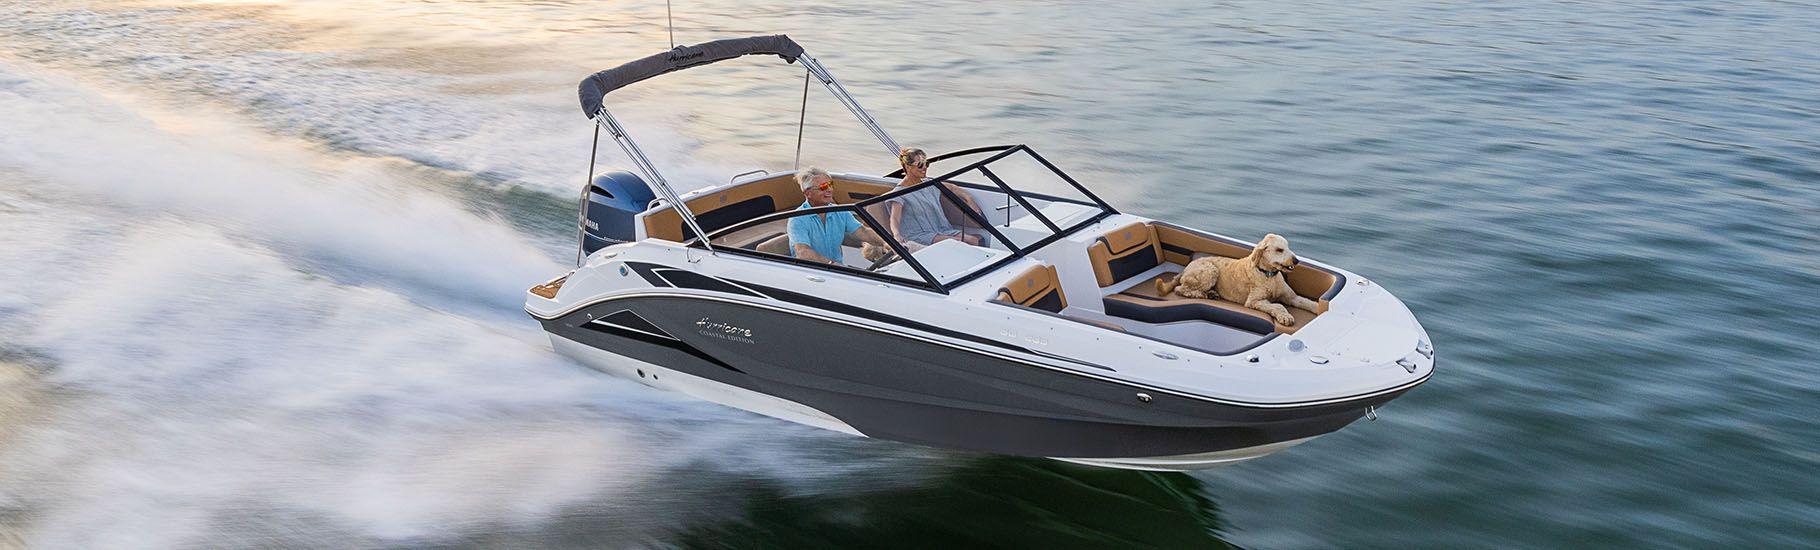 Hurricane SunDeck OB deck boat